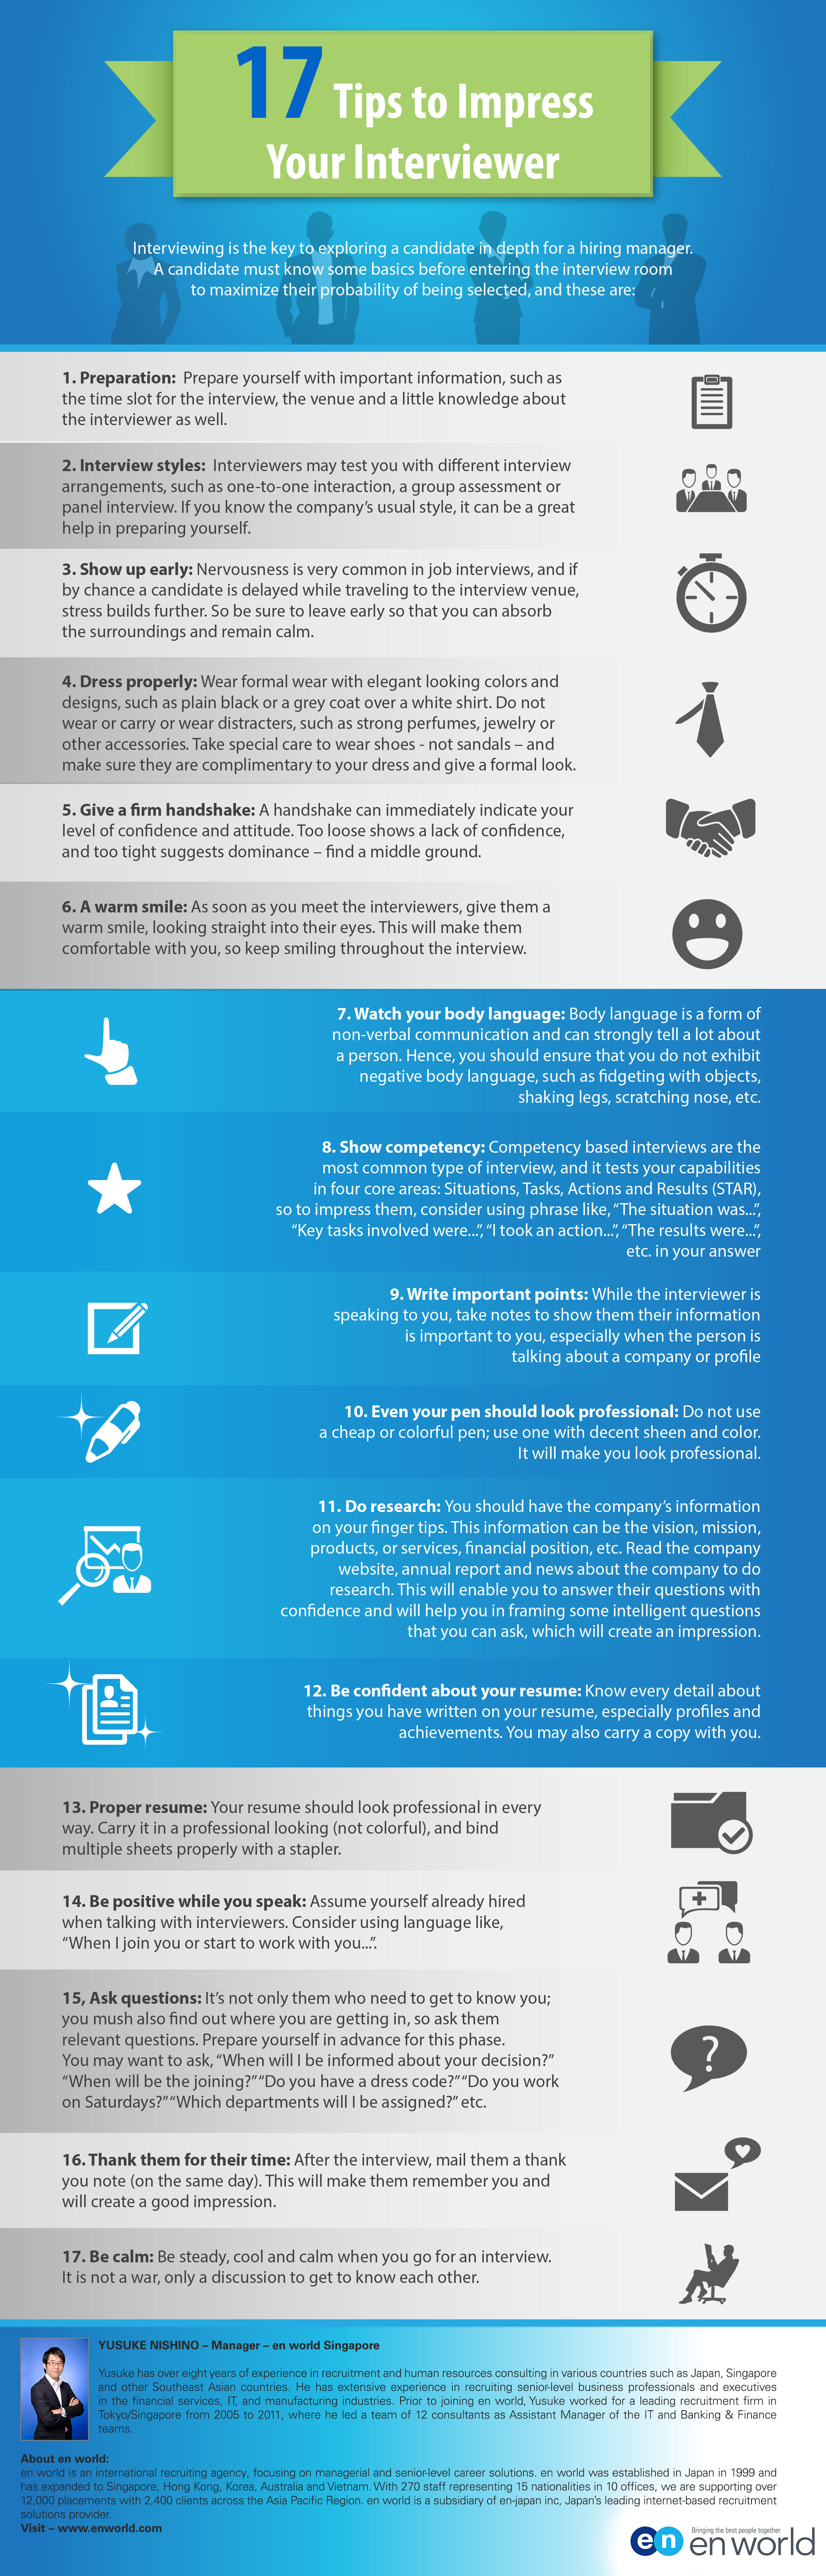 17_tips_to_impress_employer-(1)